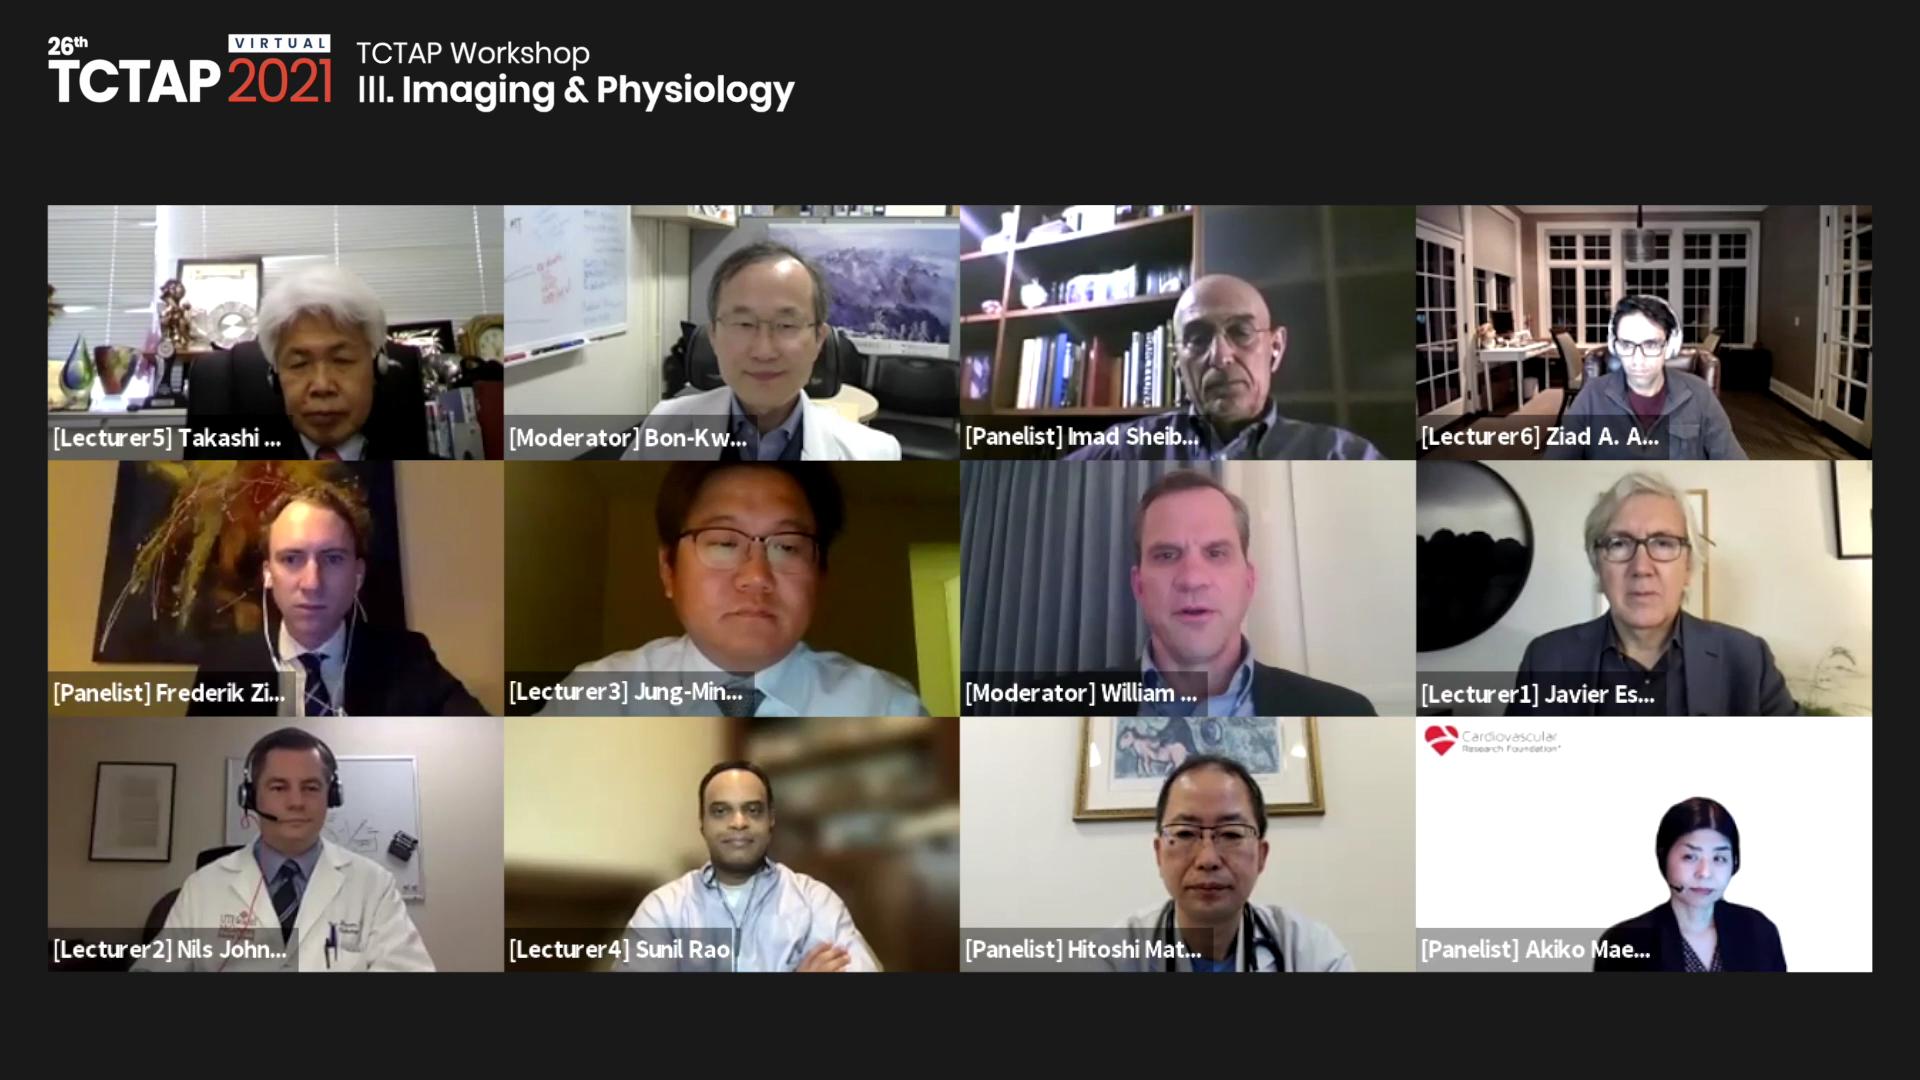 [TCTAP 2021 Virtual] TCTAP Workshop - Ⅲ. Imaging & Physiology